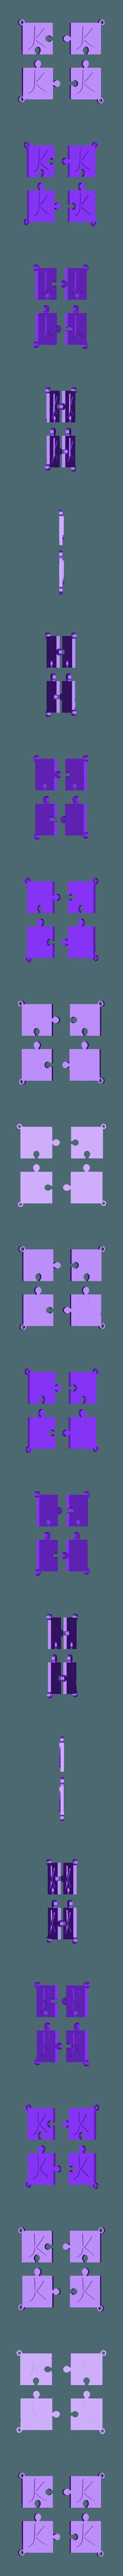 puzzle k.stl Download STL file puzzle key ring • 3D printing design, catf3d